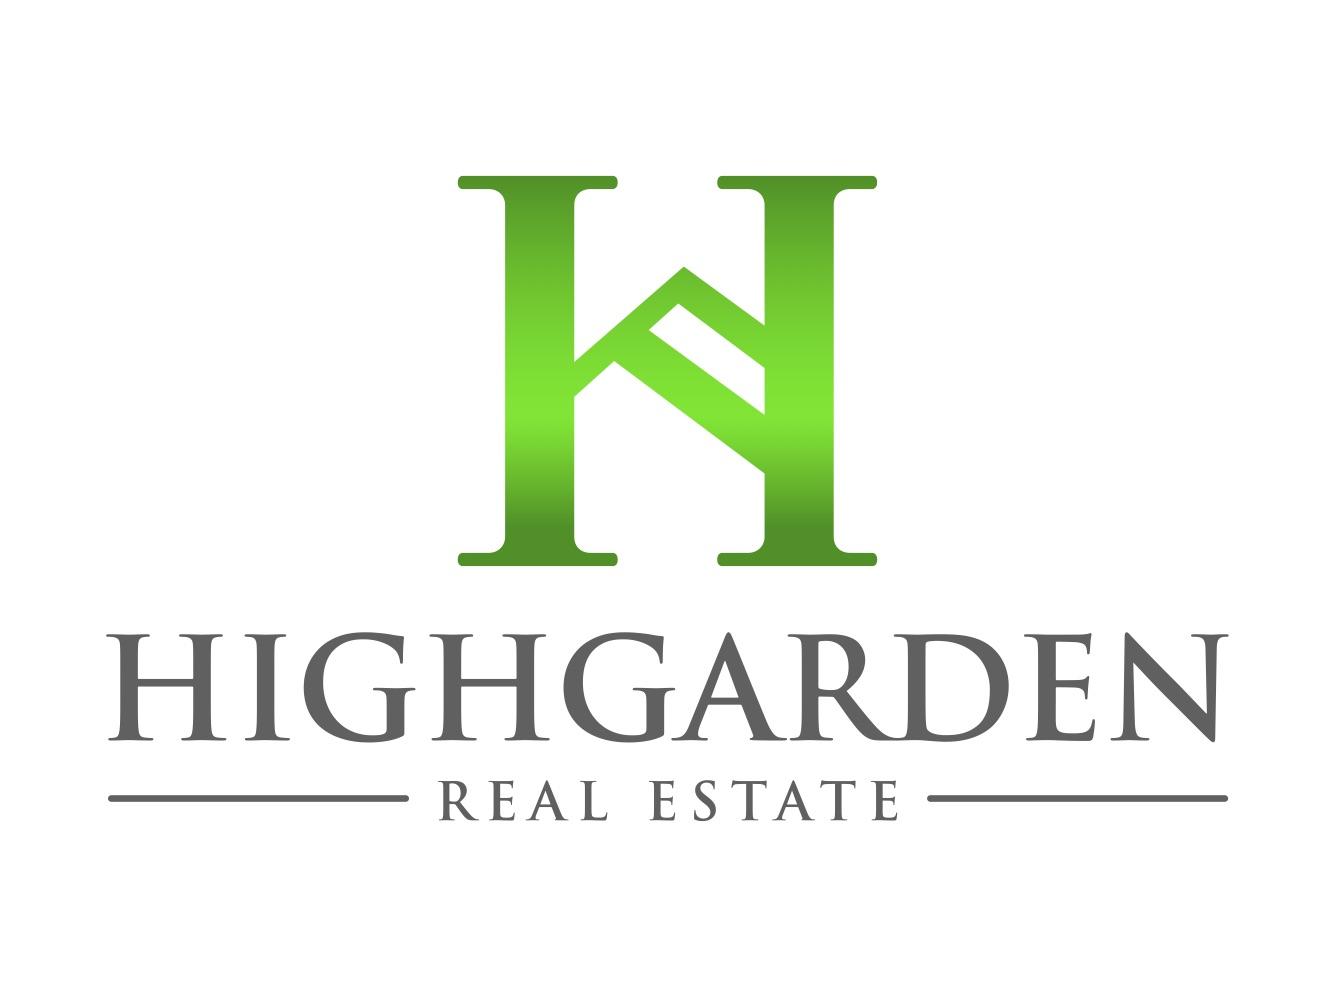 Easystreet Realty Announces Rebranding To Highgarden Real